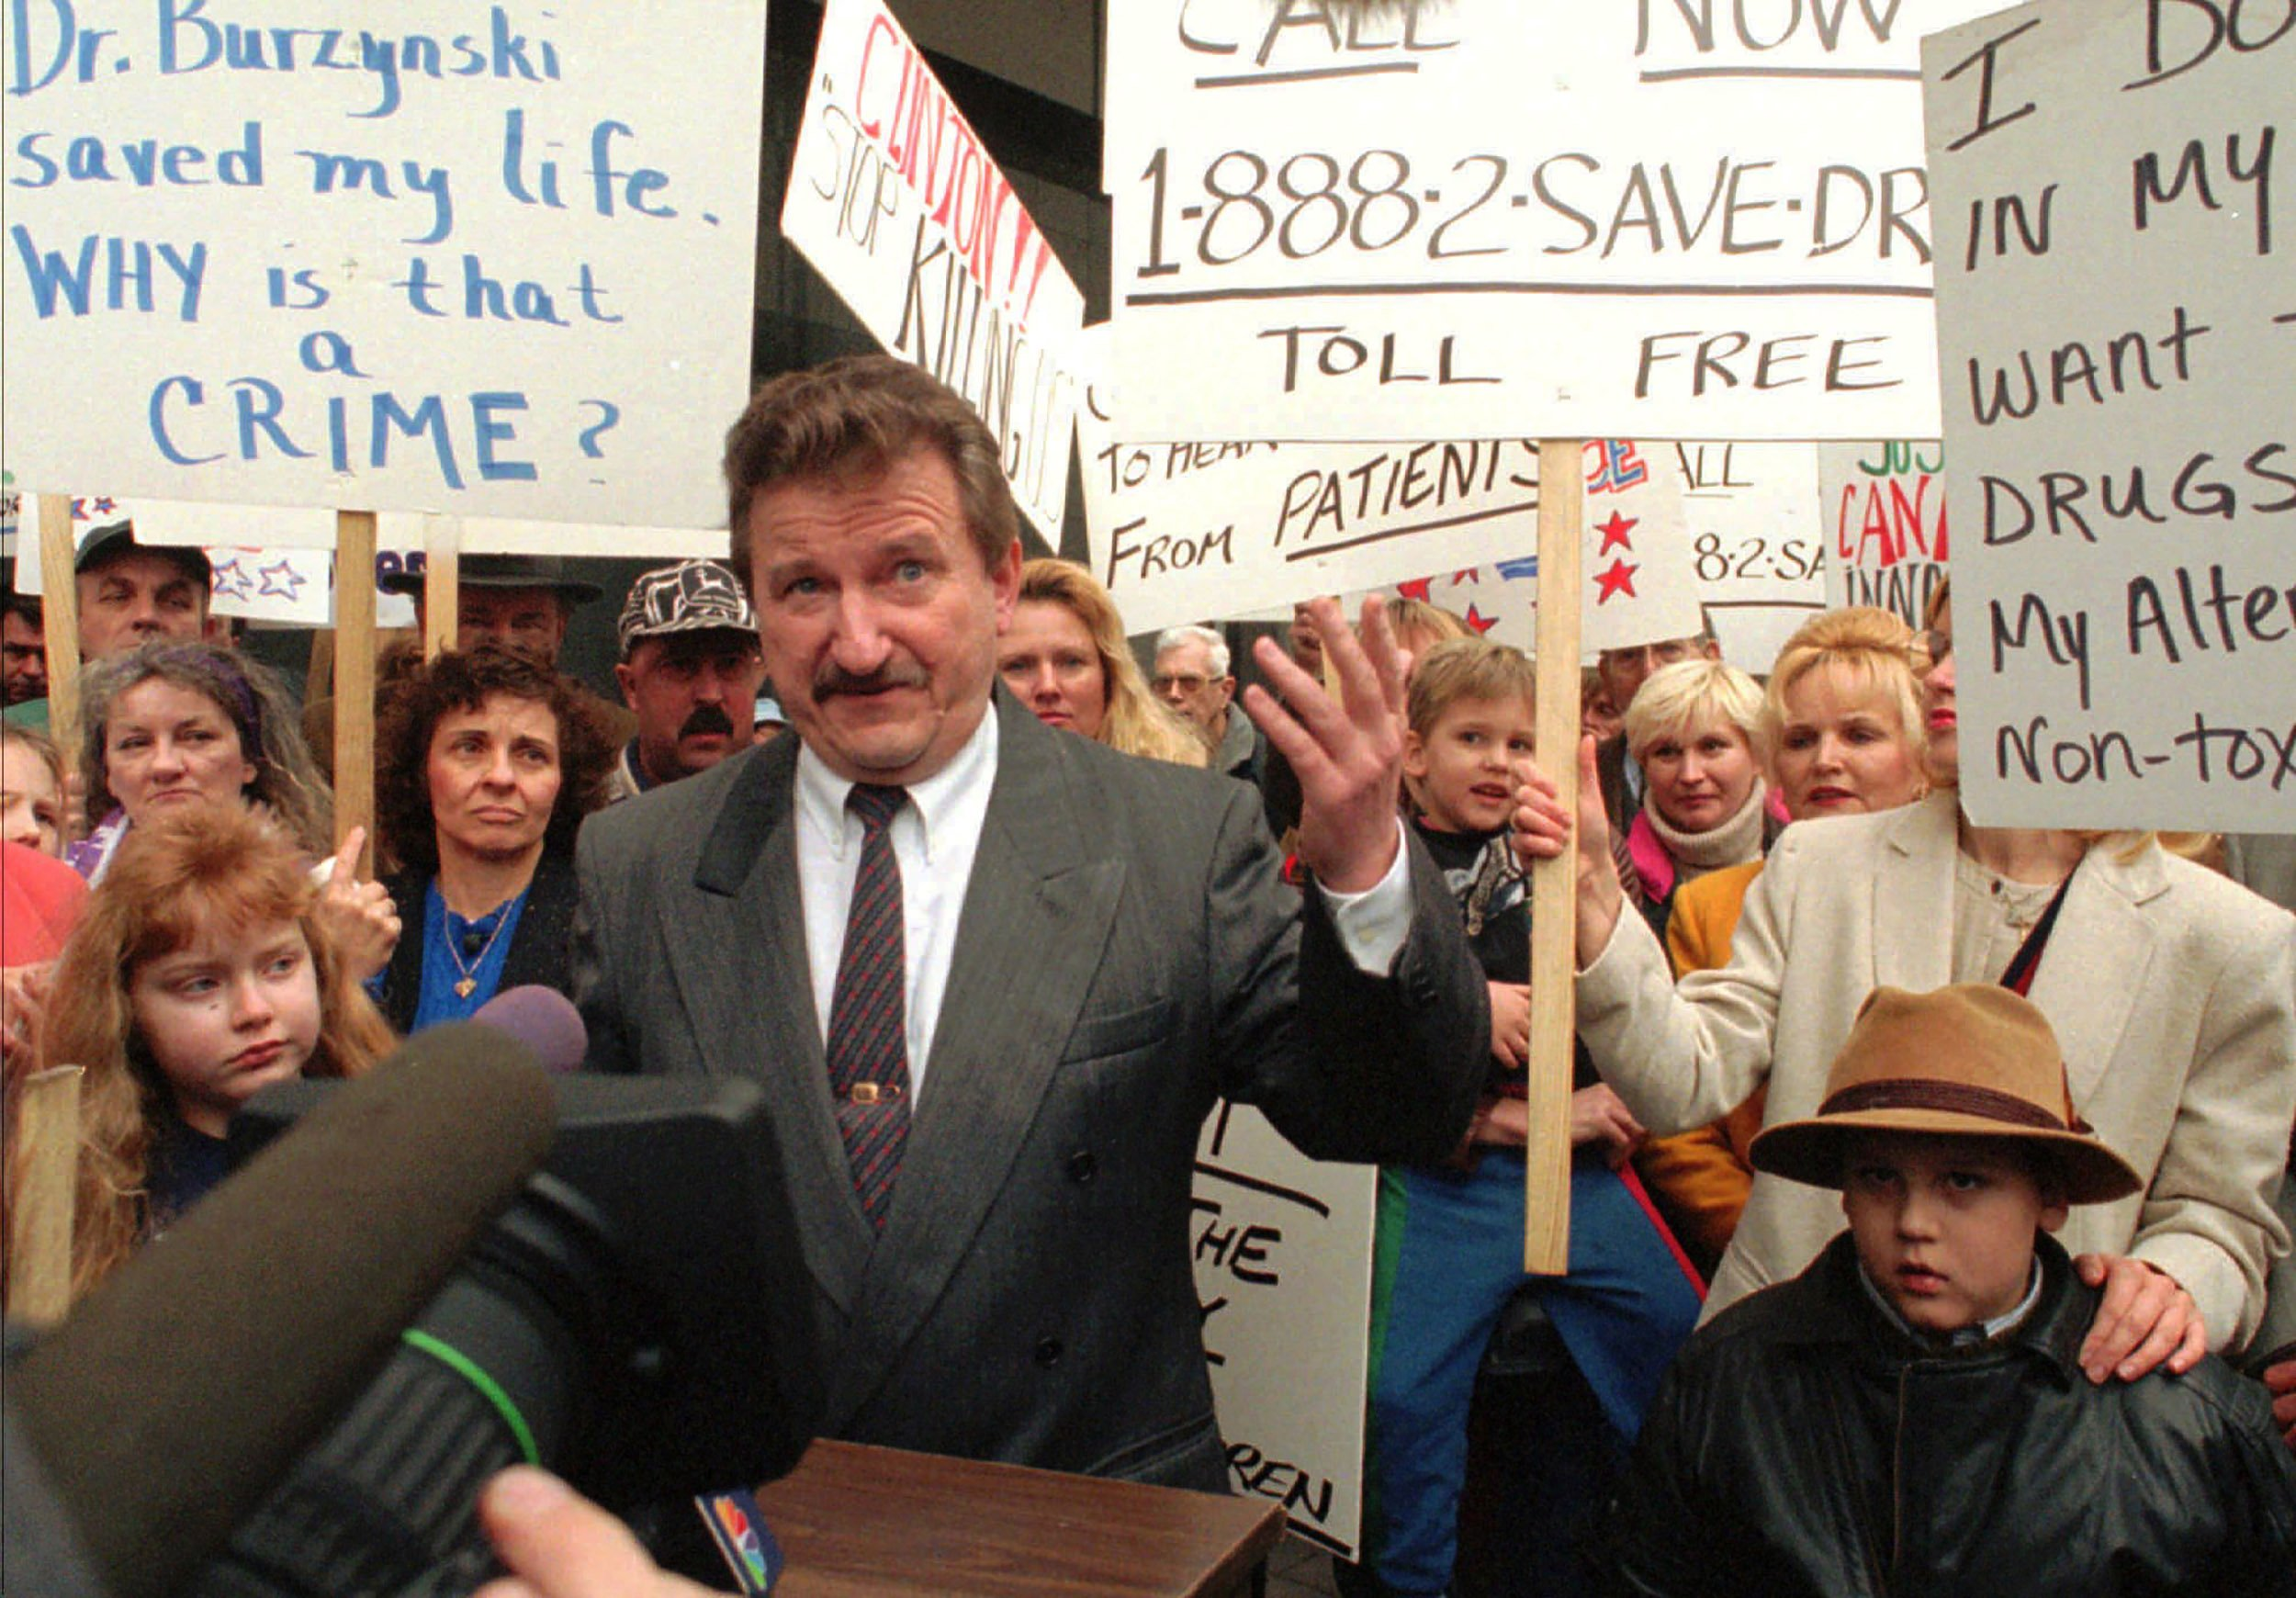 Cancer 'Visionary' Stanislaw Burzynski Stands Trial for